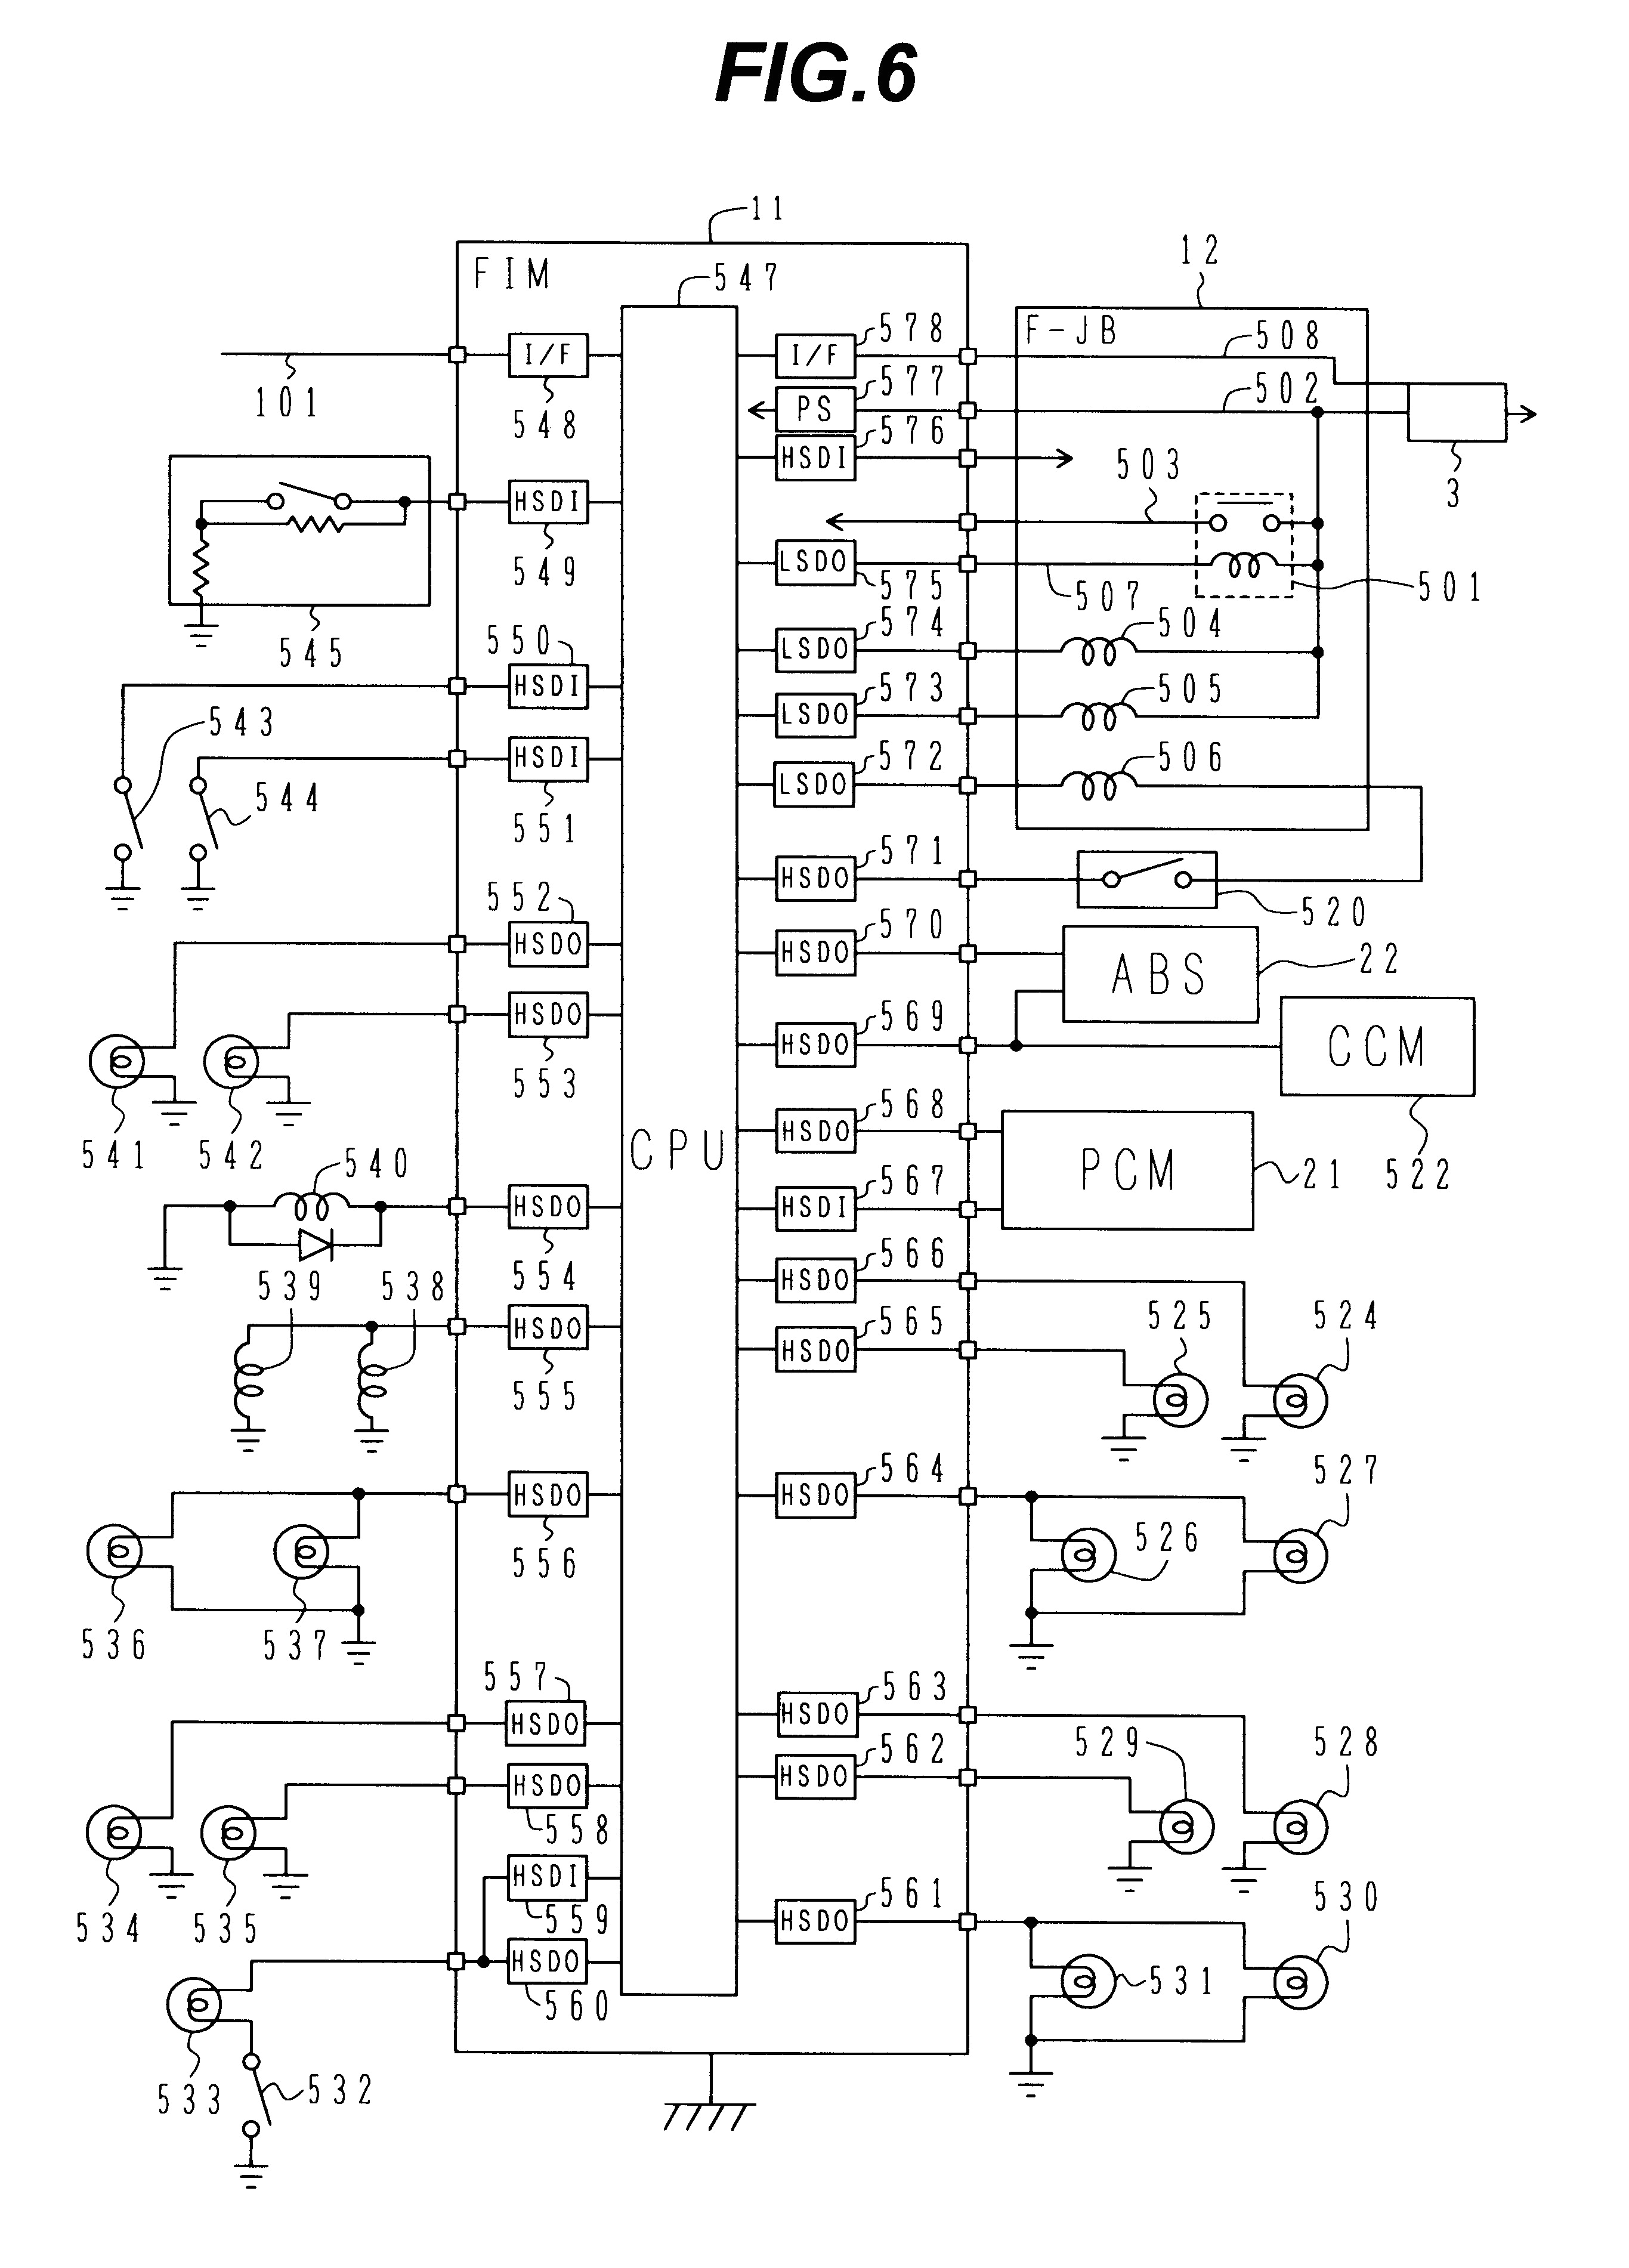 international 90 fuse box diagram data diagram schematic 1996 international 4700 fuse panel diagram wiring diagram